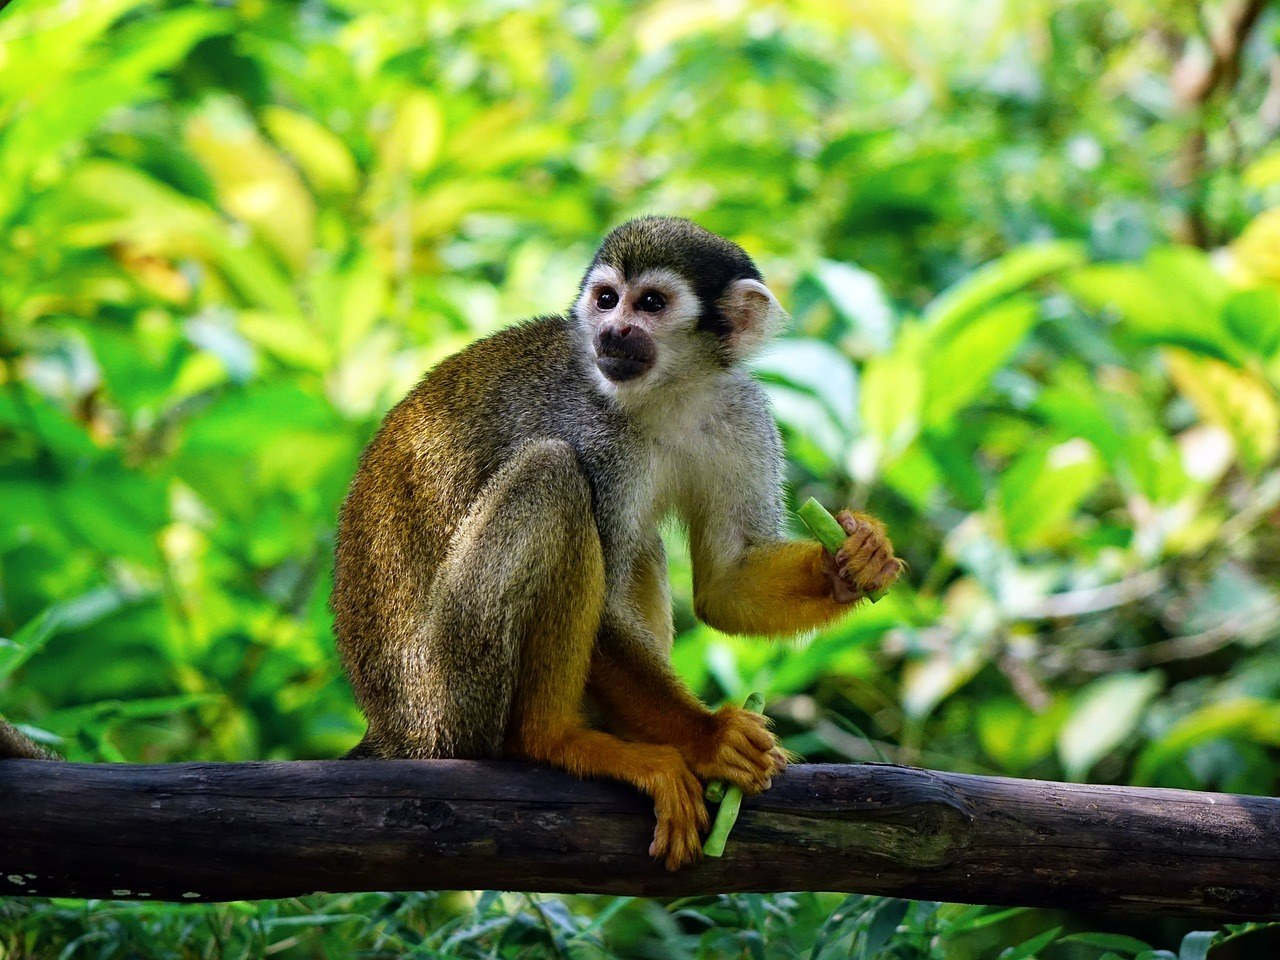 World of Birds Wildlife Sanctuary and Monkey Park1